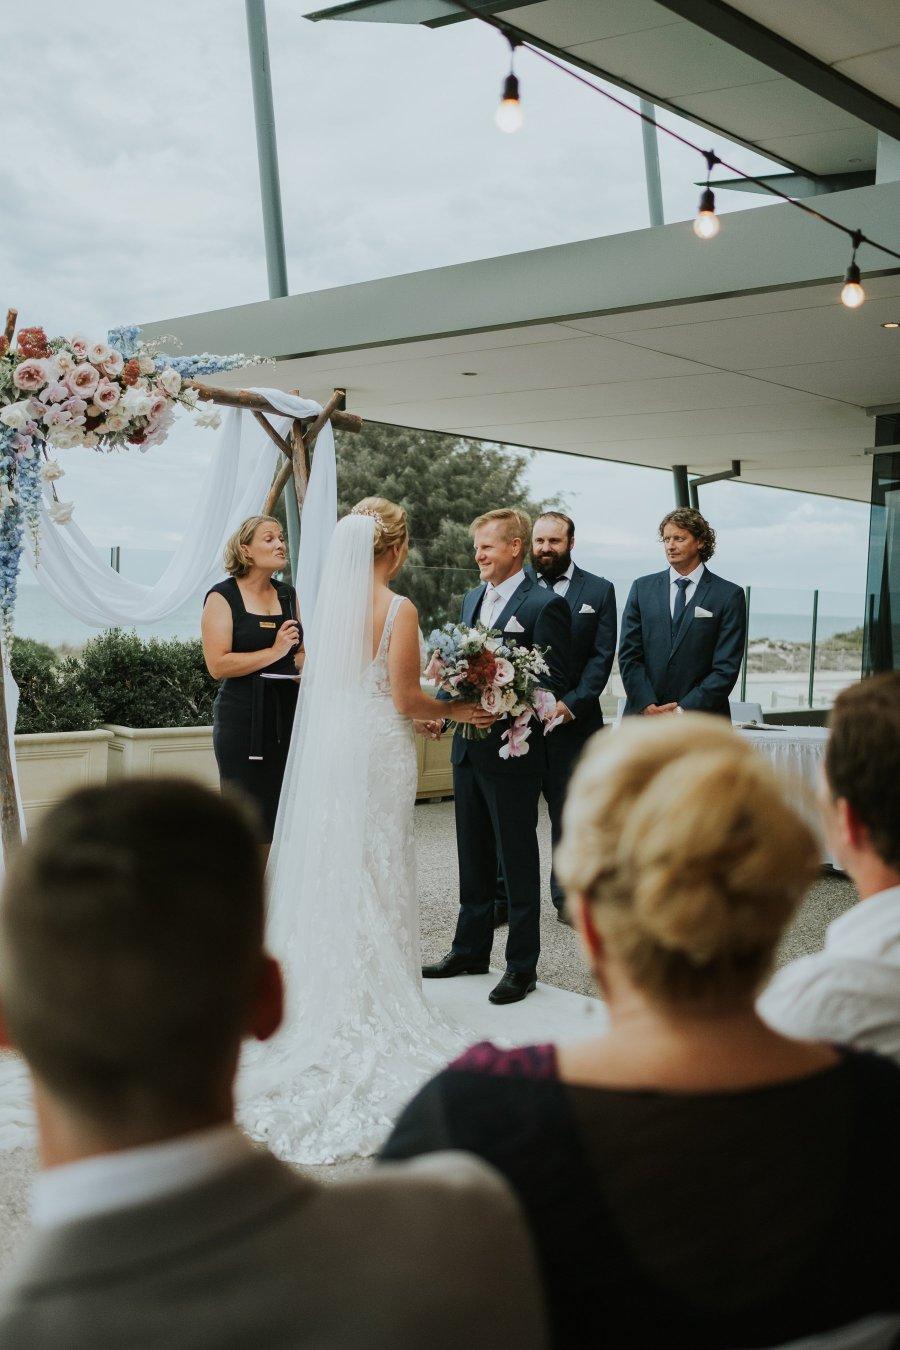 Kate + Graeme | Mindarie Wedding | Ebony Blush Photography | Zoe Theiadore | Perth wedding Photographer103